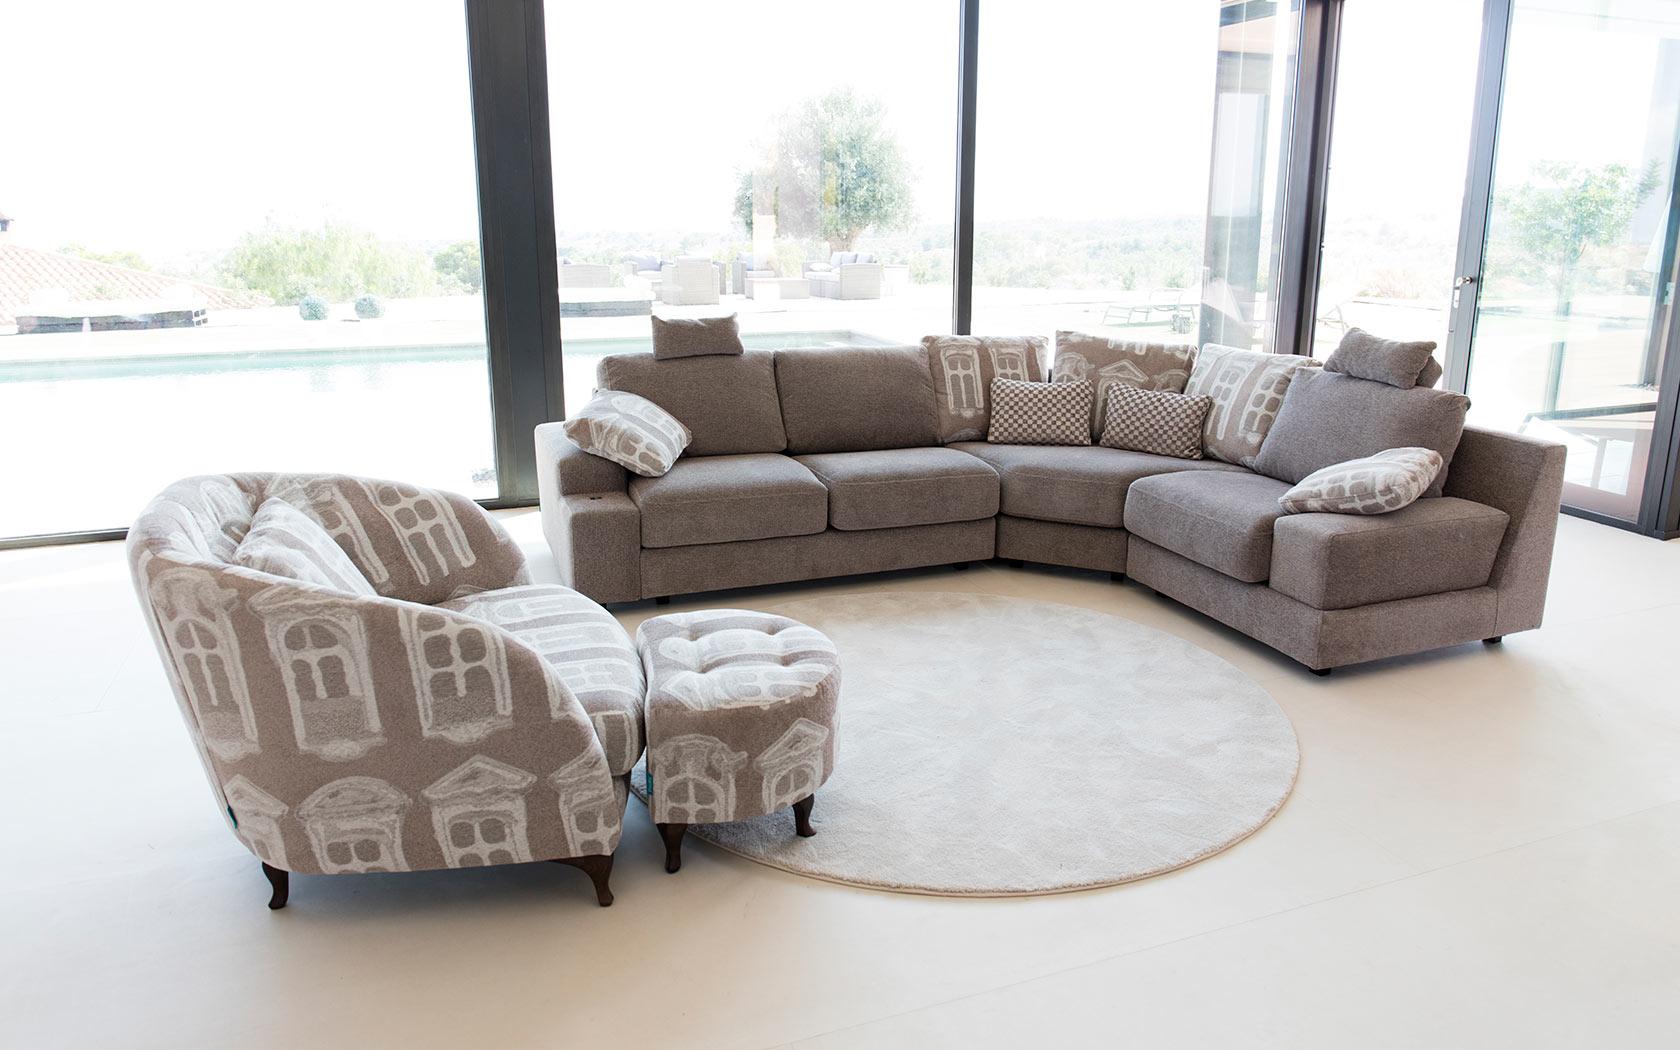 Calessi sofa Fama 2019 03